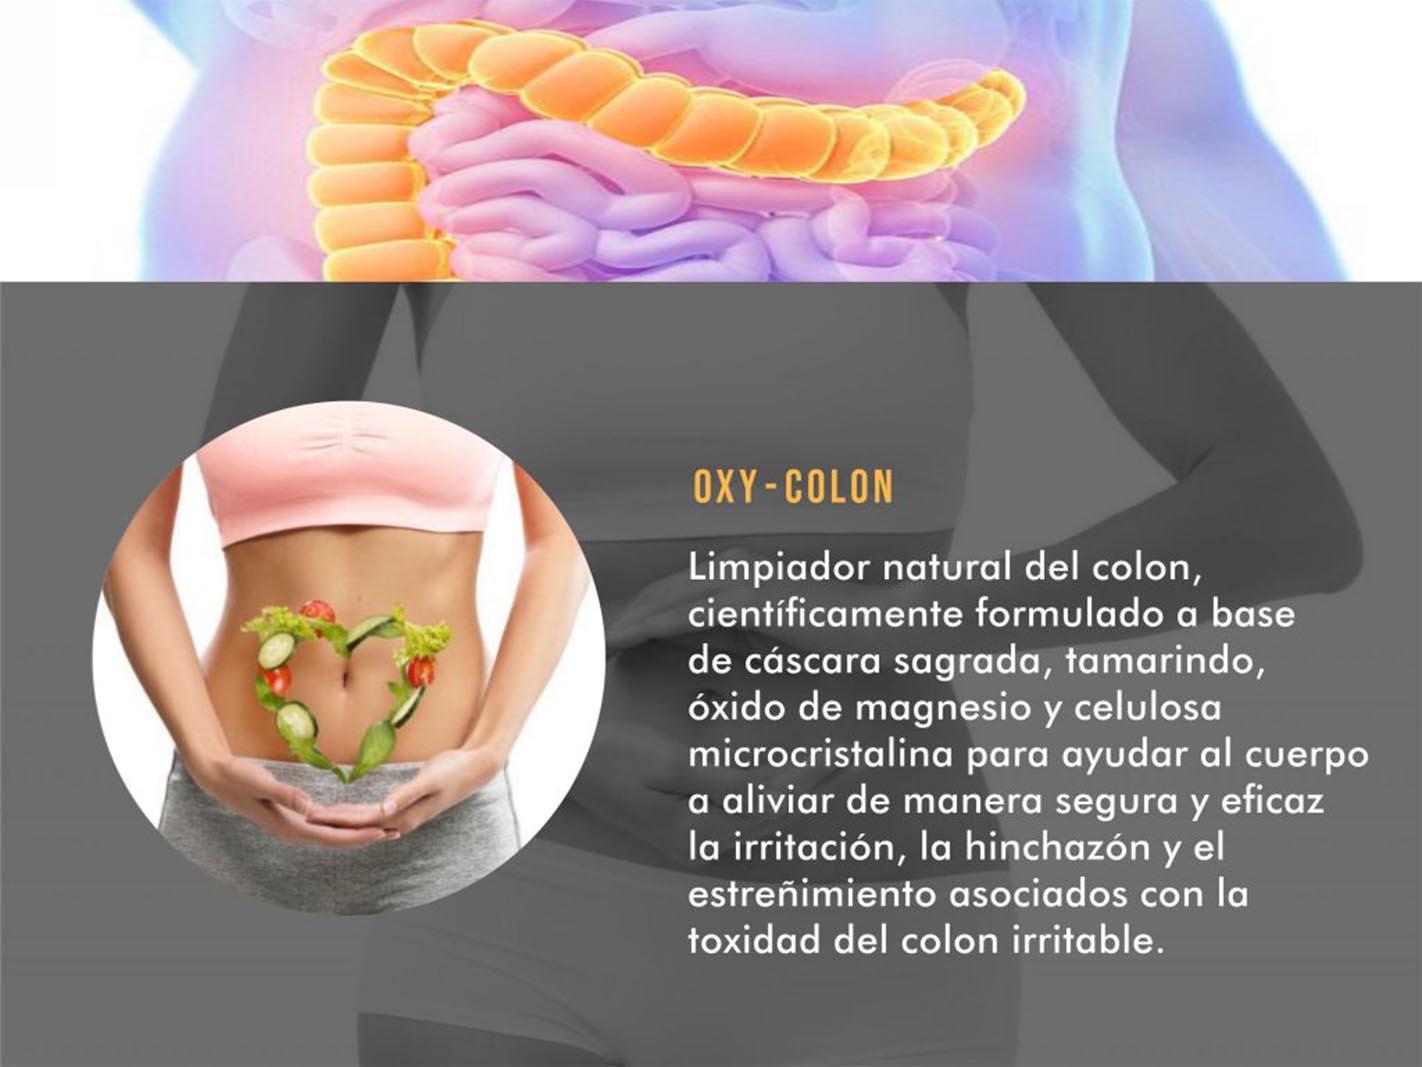 Oxy Colon